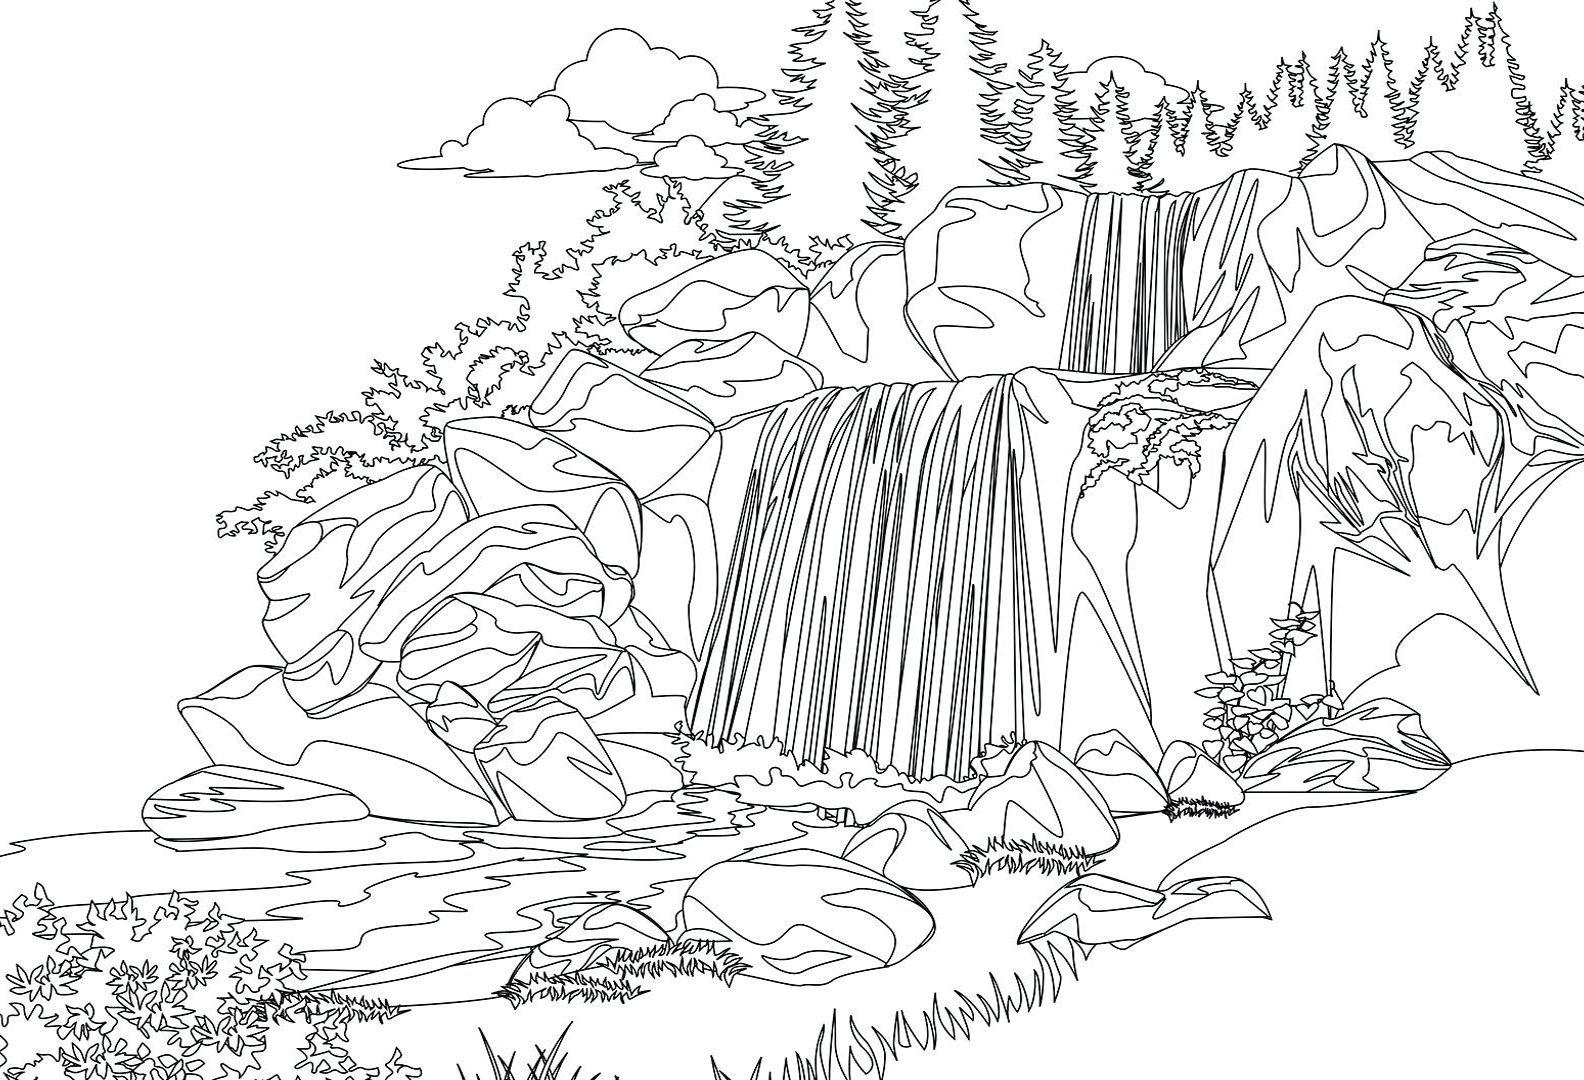 Catatanku Anak Desa Gambar Pemandangan Air Terjun Untuk Mewarnai